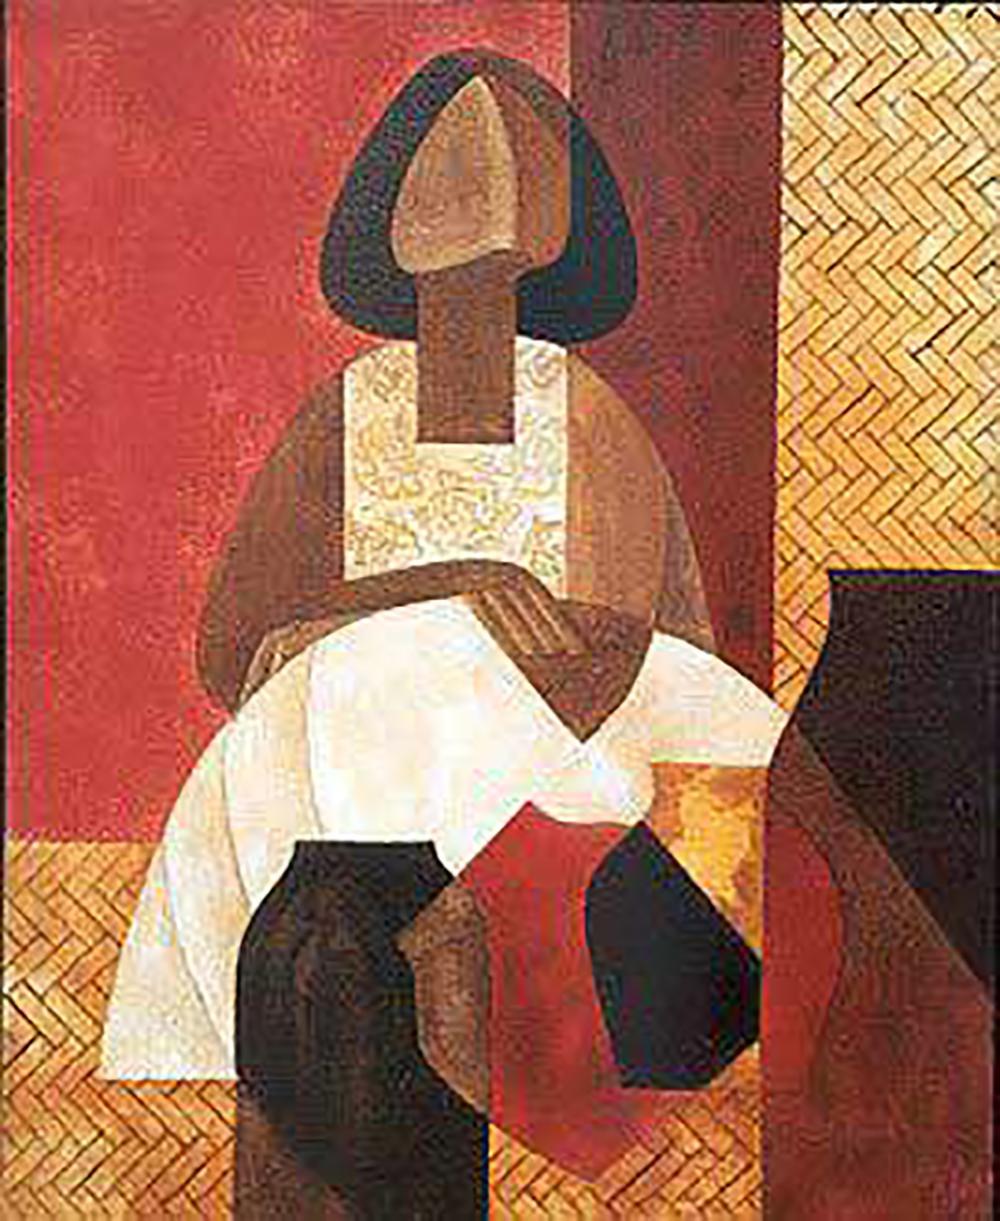 Lot 3233: Lalo Garcia Original on canvas.